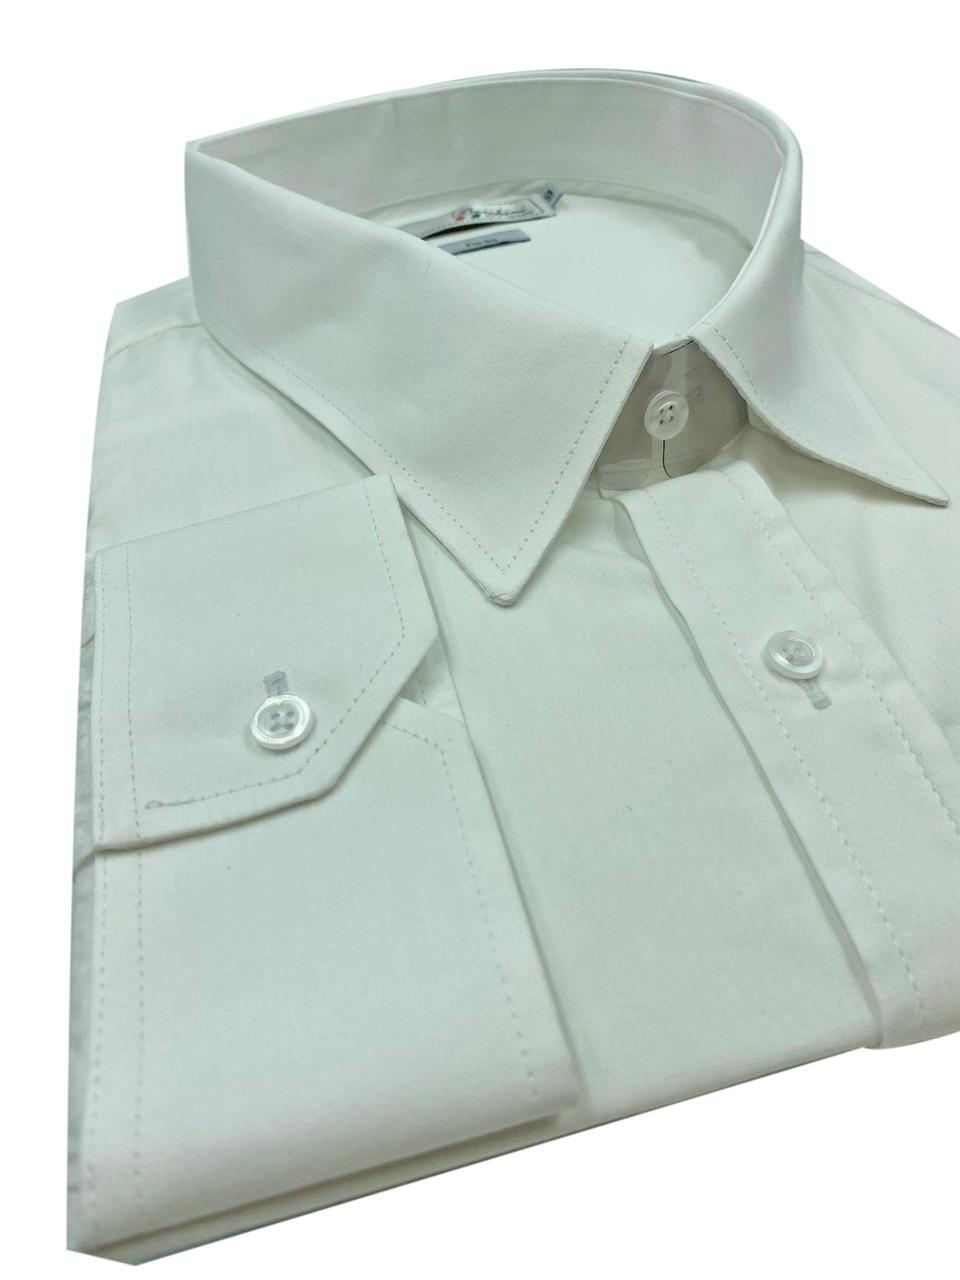 Camisa Social Manga Longa Masculina Plus Size Branca